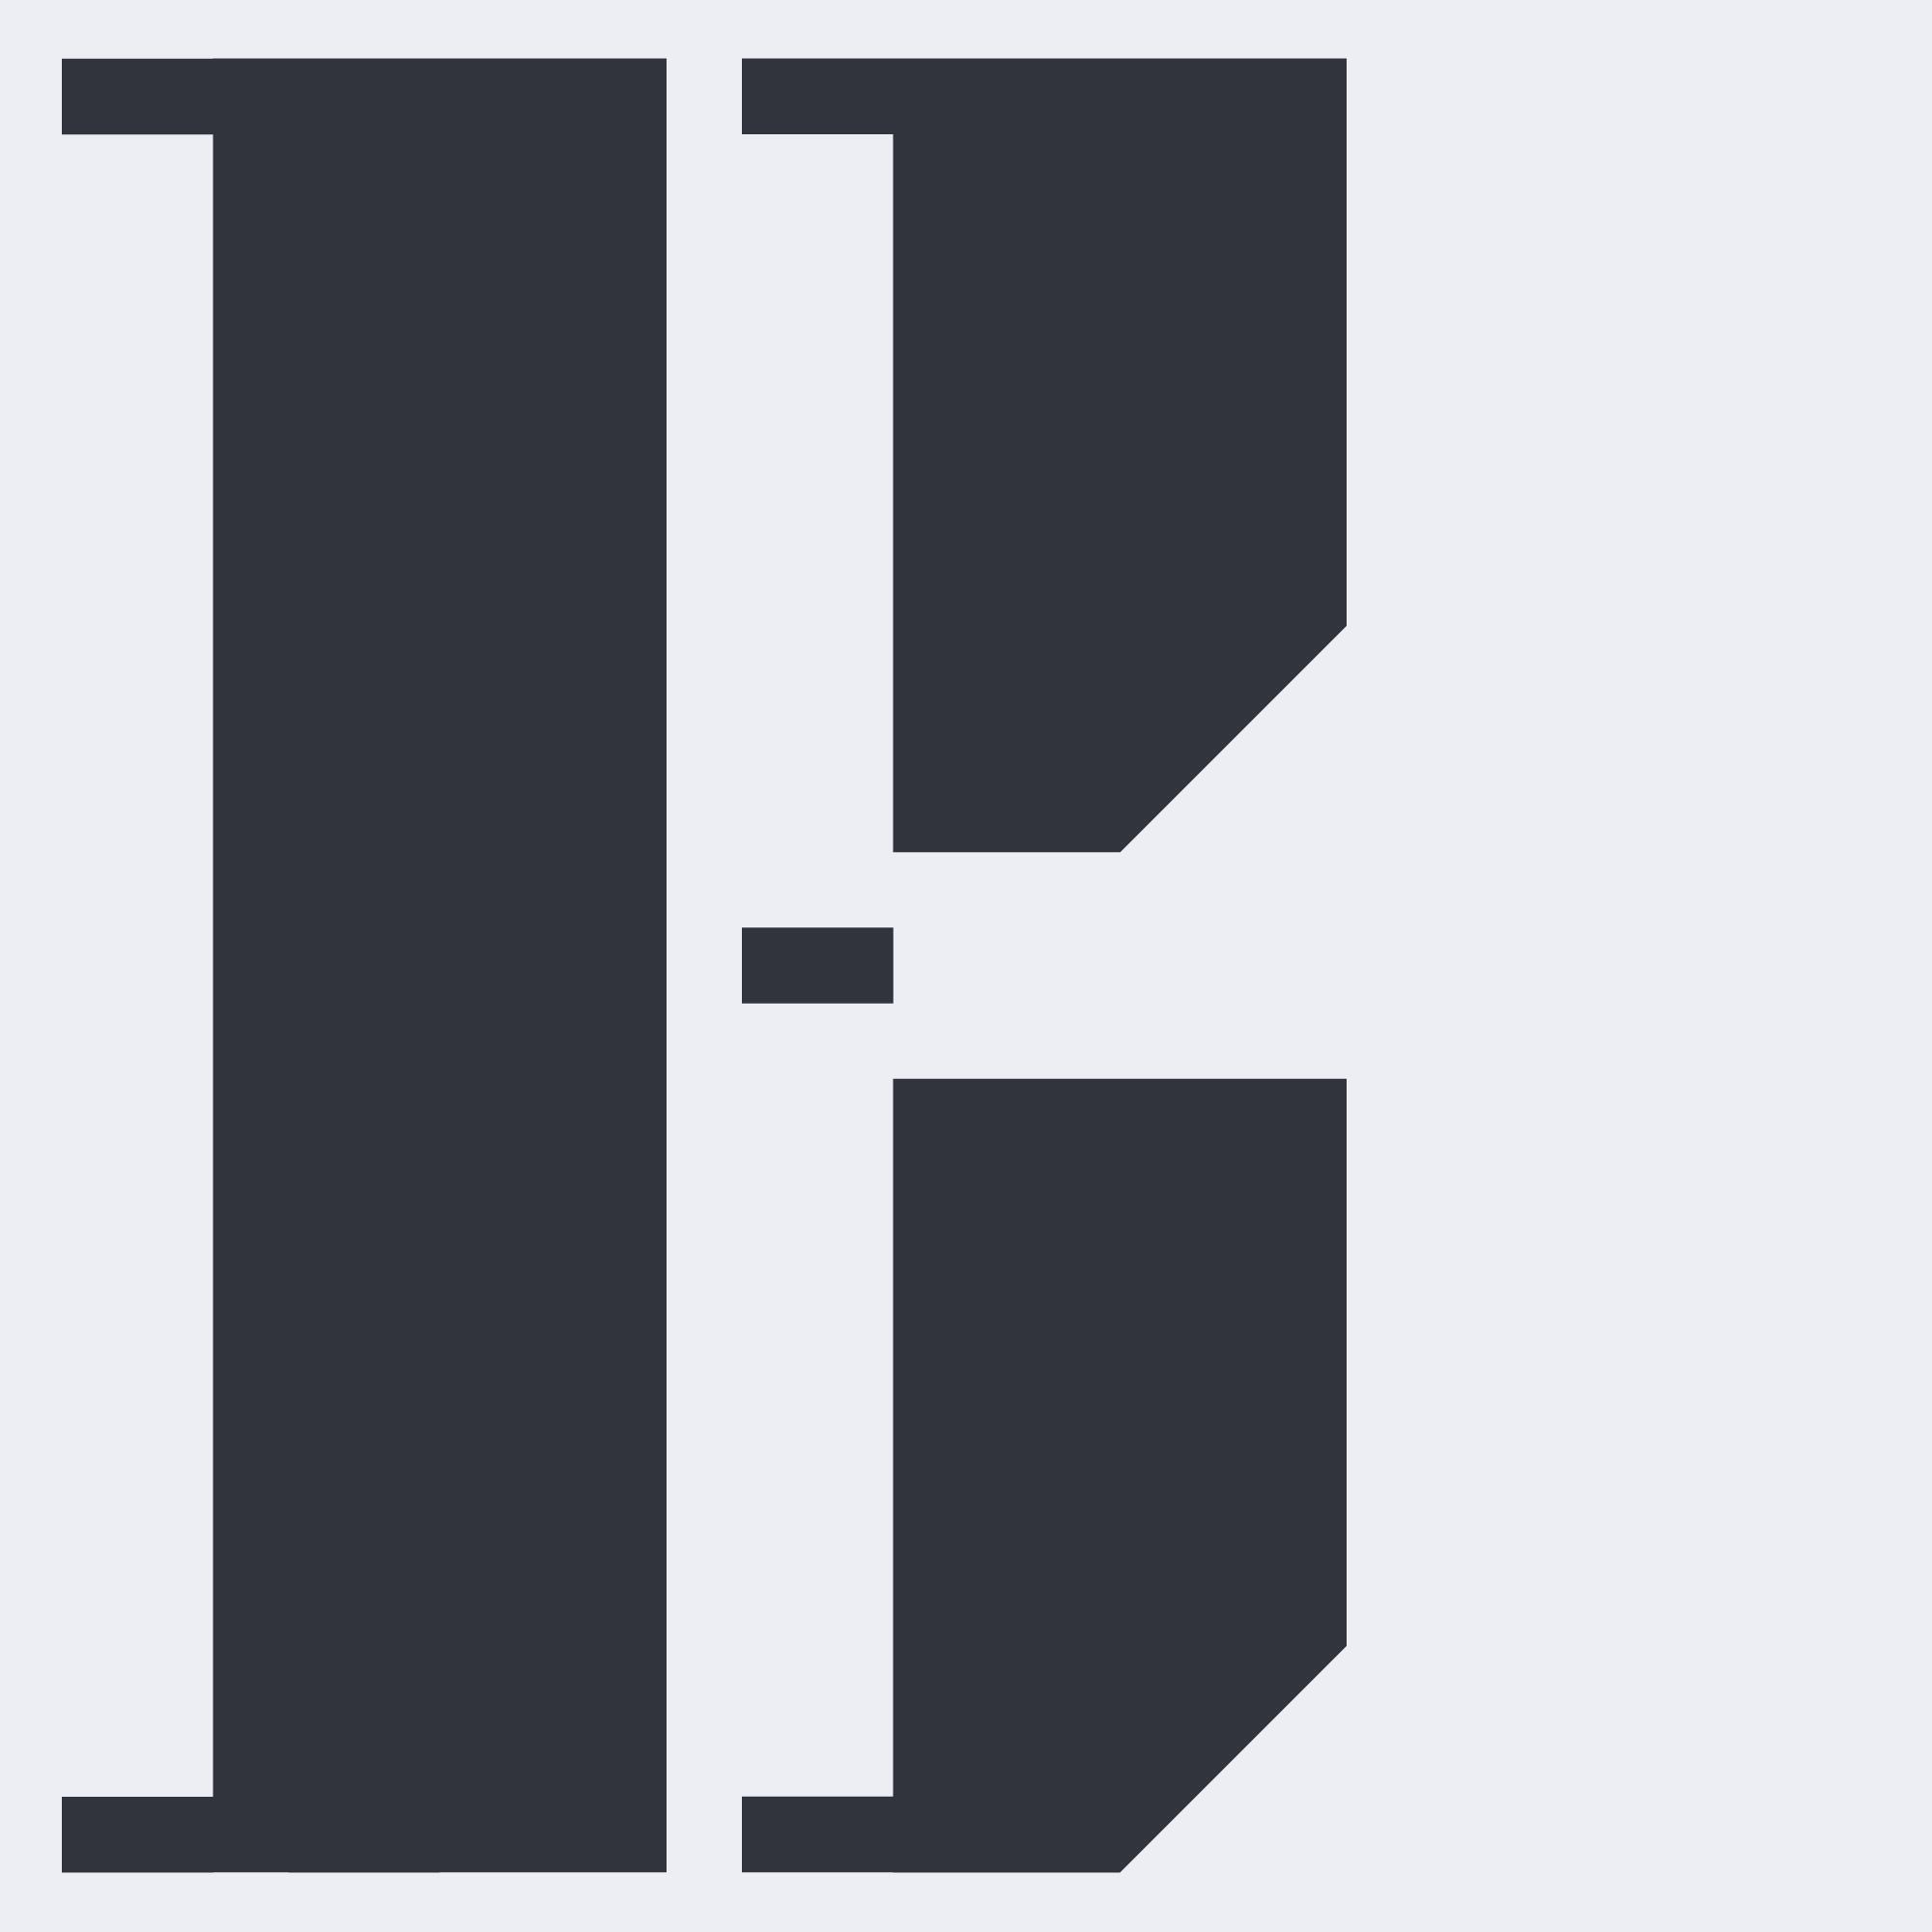 Adaptive typeface concept - eyeondesign - sam_hall   ello